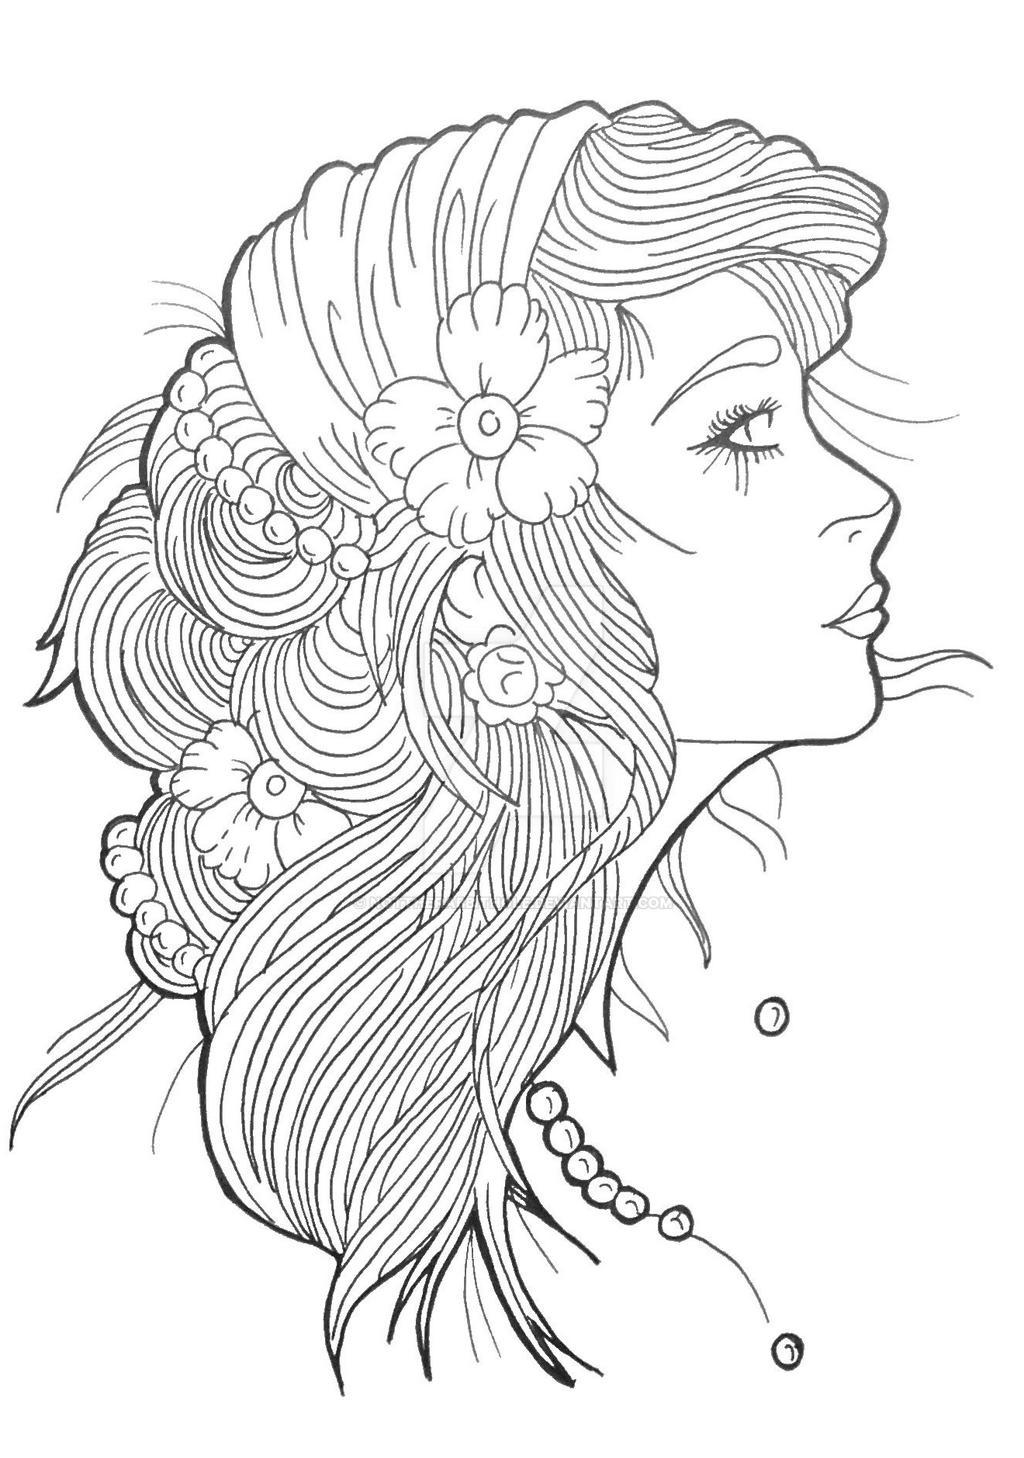 Gypsy Girl By Nottherabbithole On DeviantArt